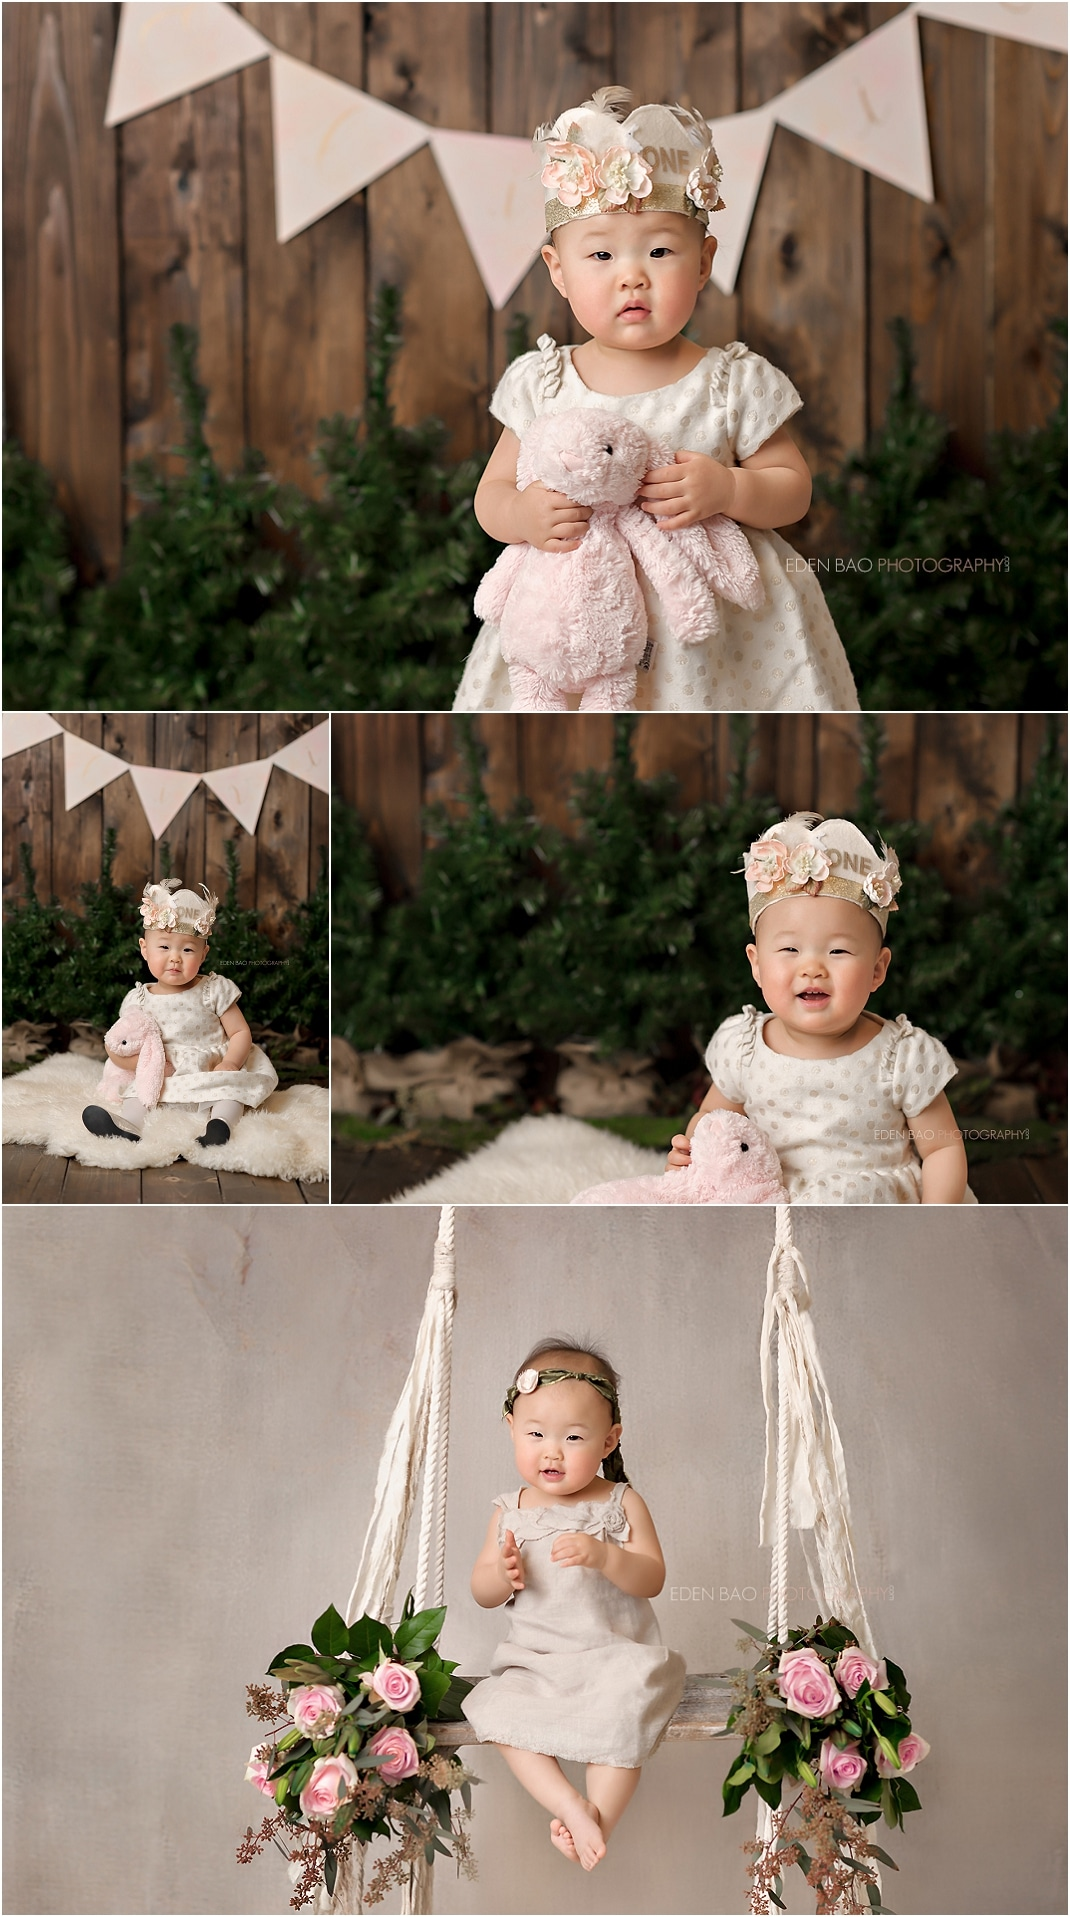 Kirkland baby photographer rustic swing